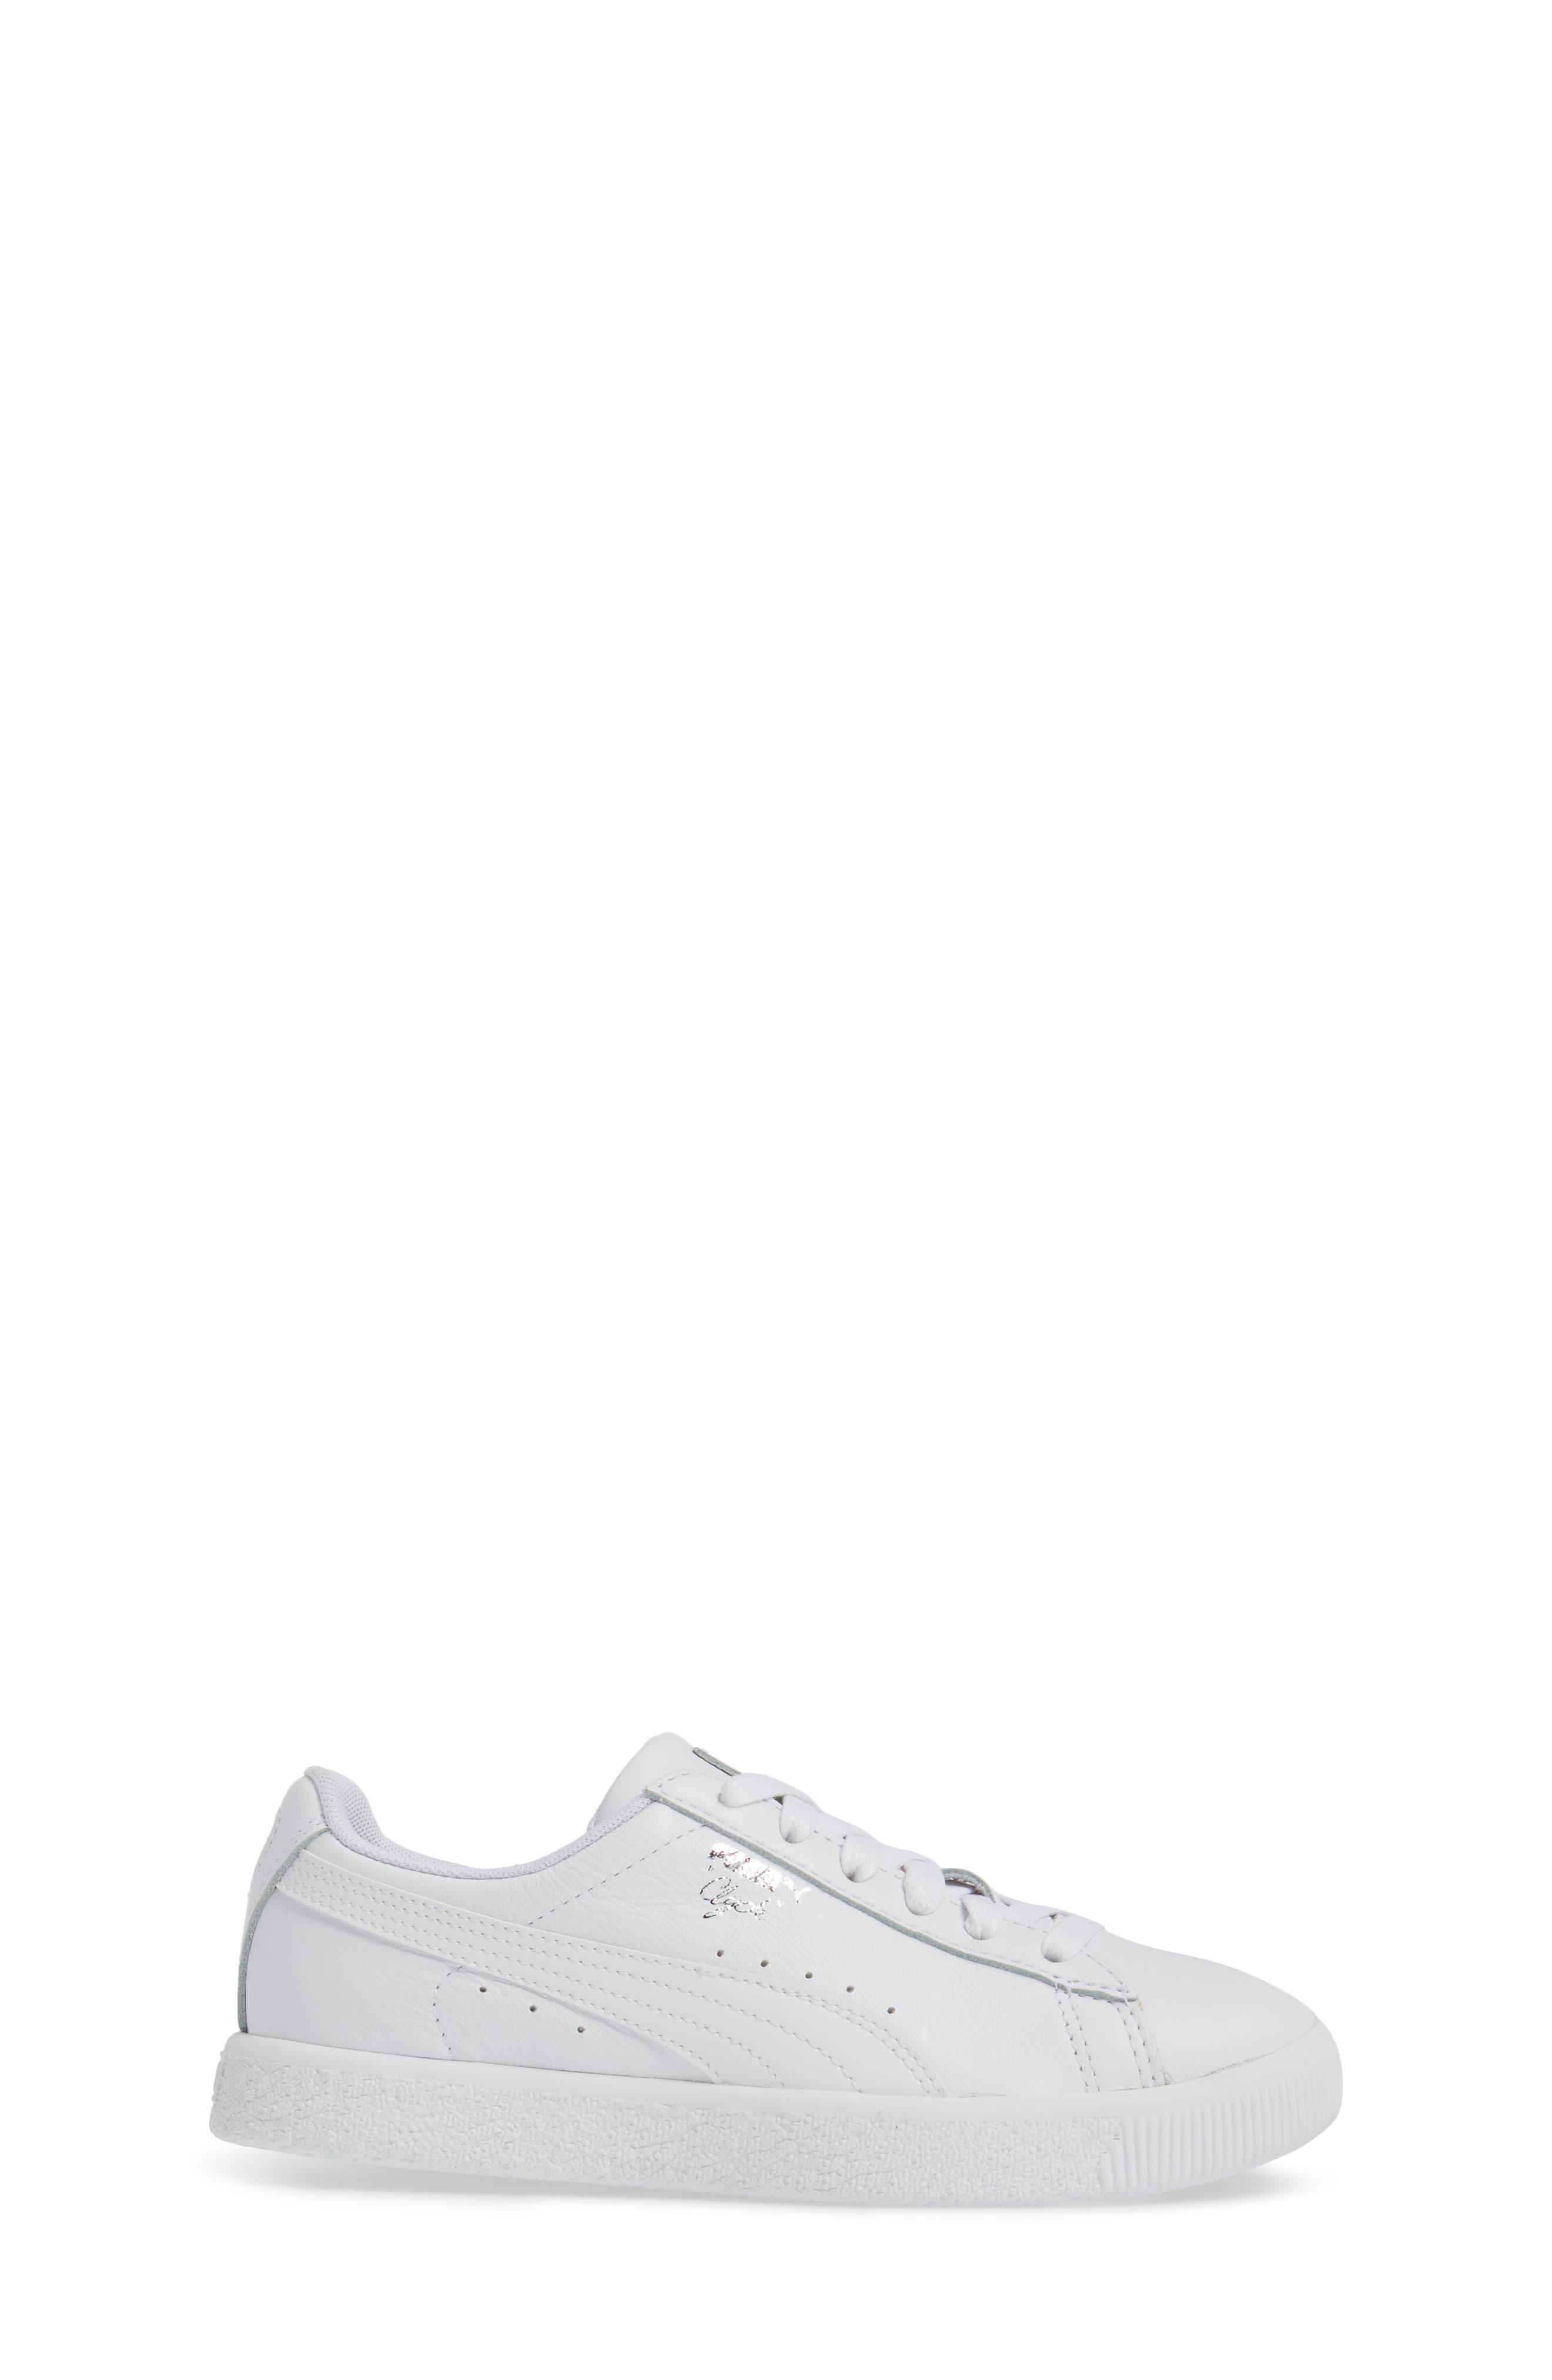 Clyde Core Foil Sneaker,                             Alternate thumbnail 3, color,                             White/ White